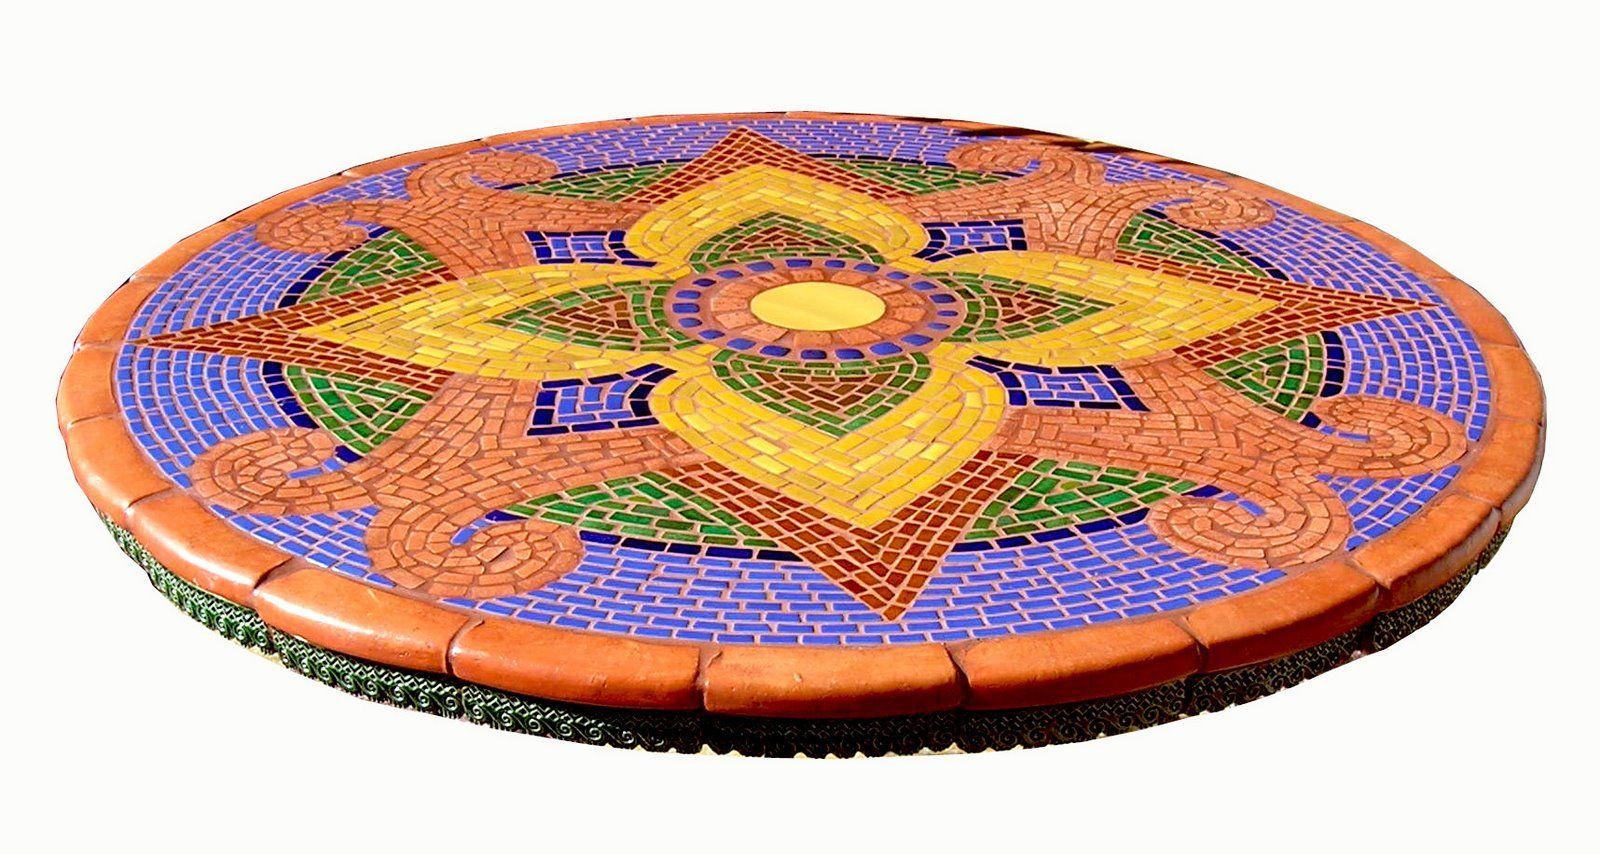 Mesa-loto-Tope-130-cms-.jpg (1600×854)